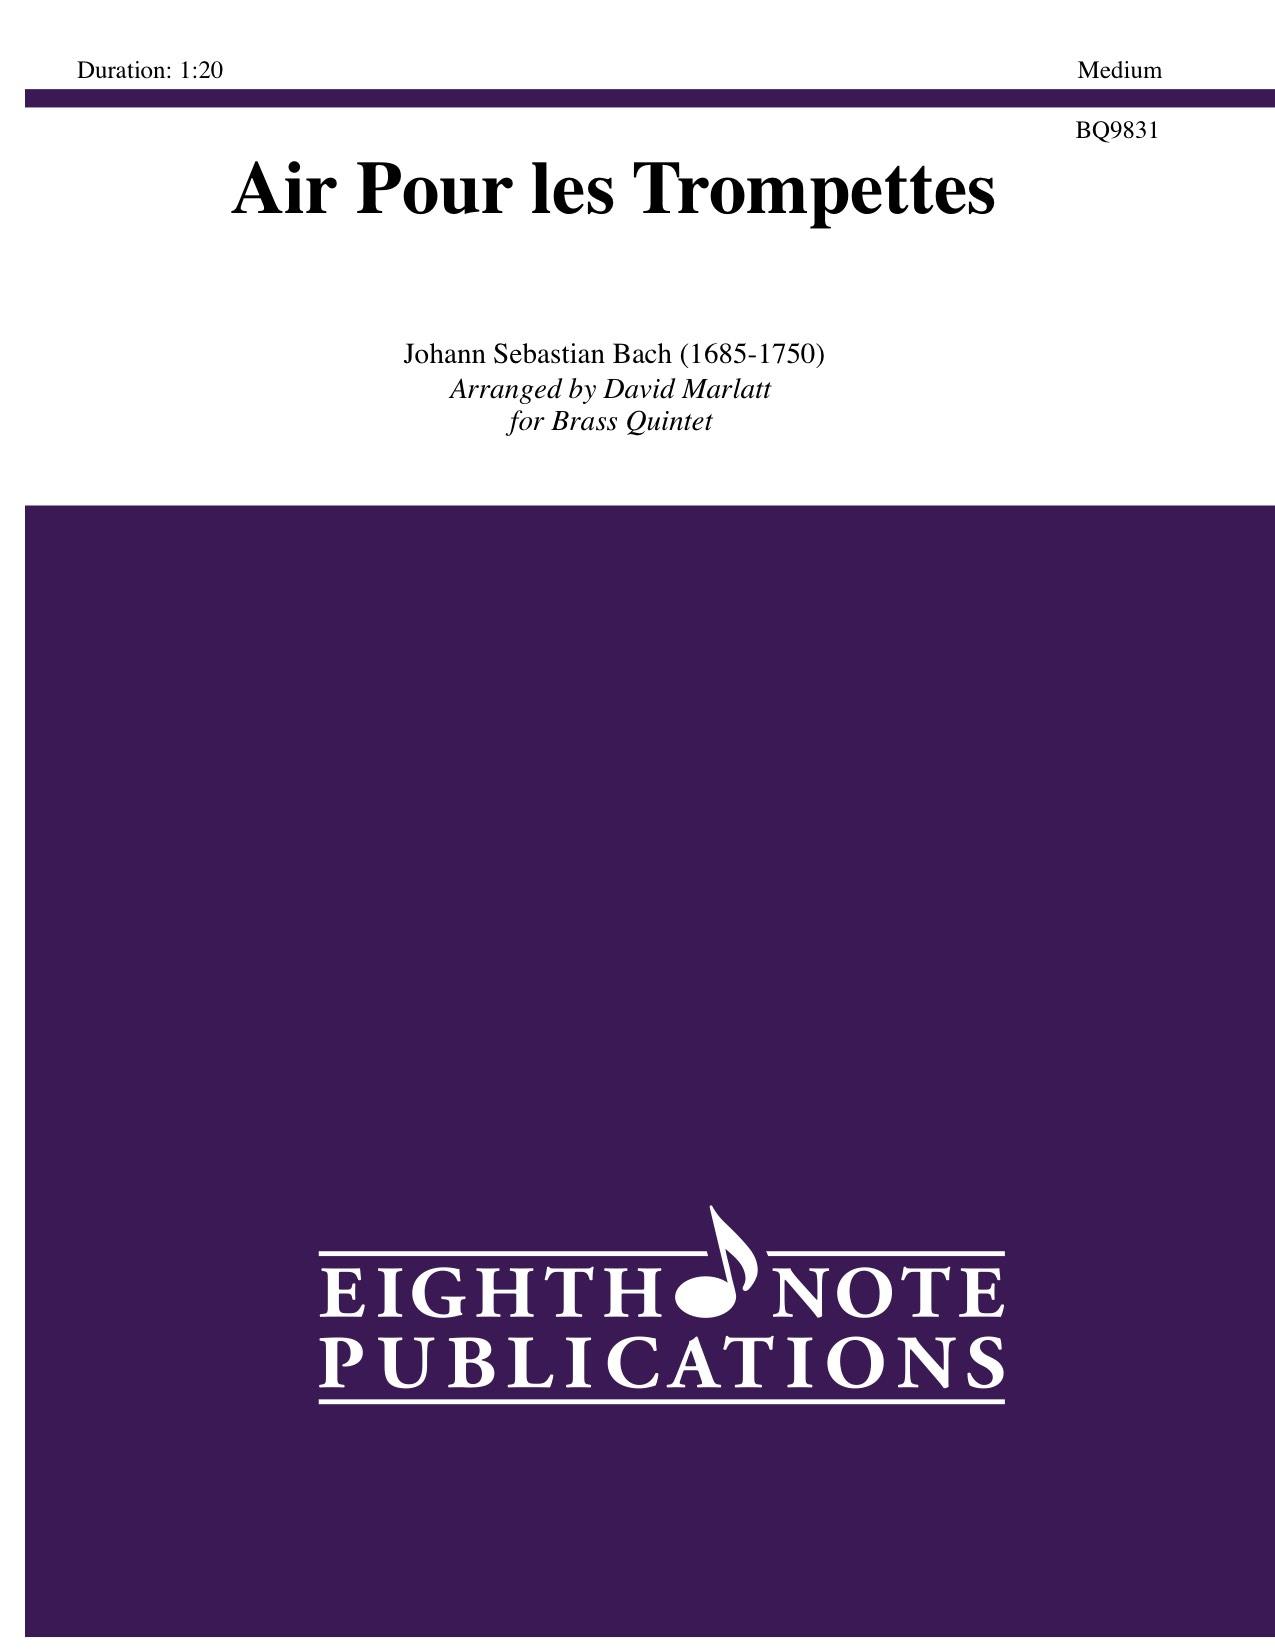 Air Pour les Trompettes - Johann Sebastian Bach